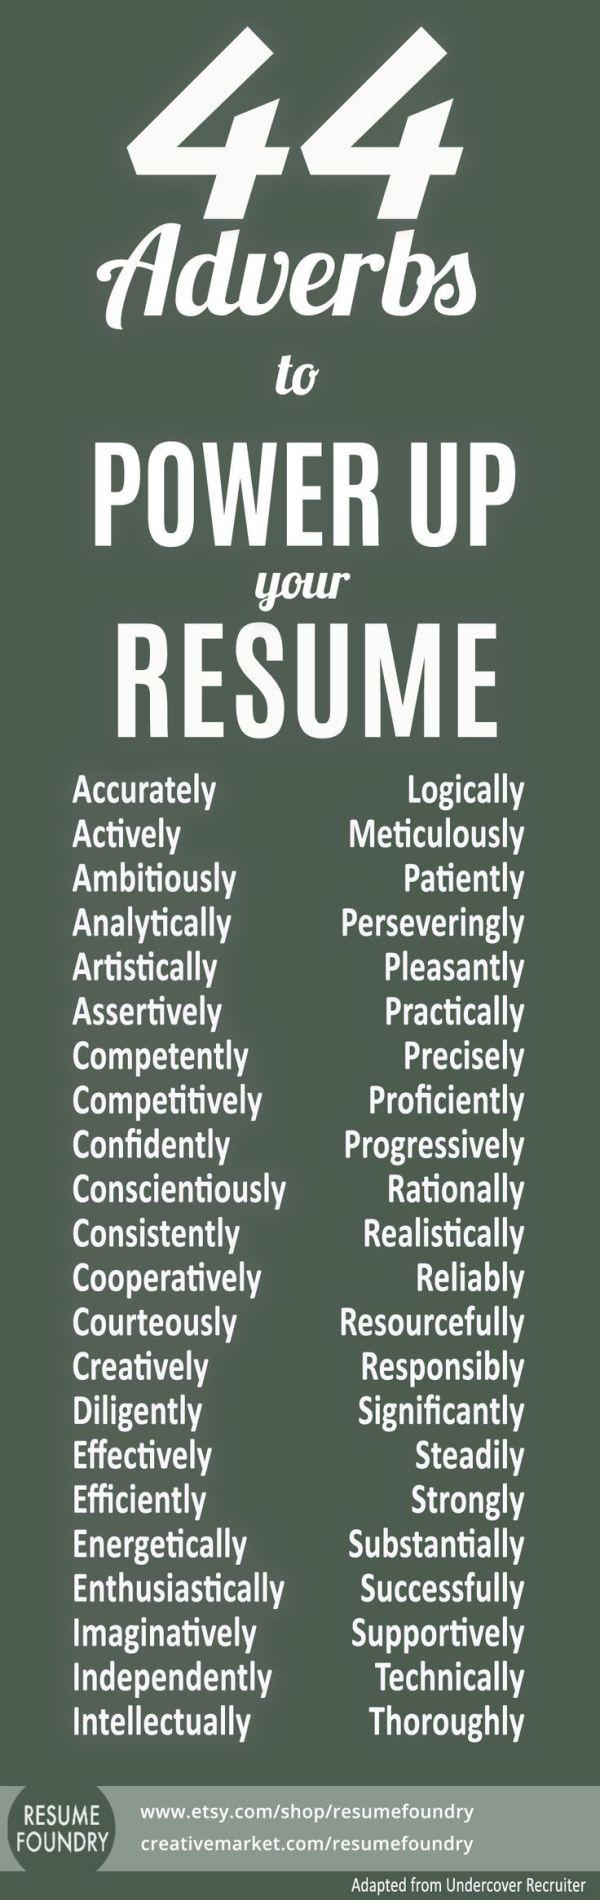 Resume tips, resume skill words, resume verbs, resume